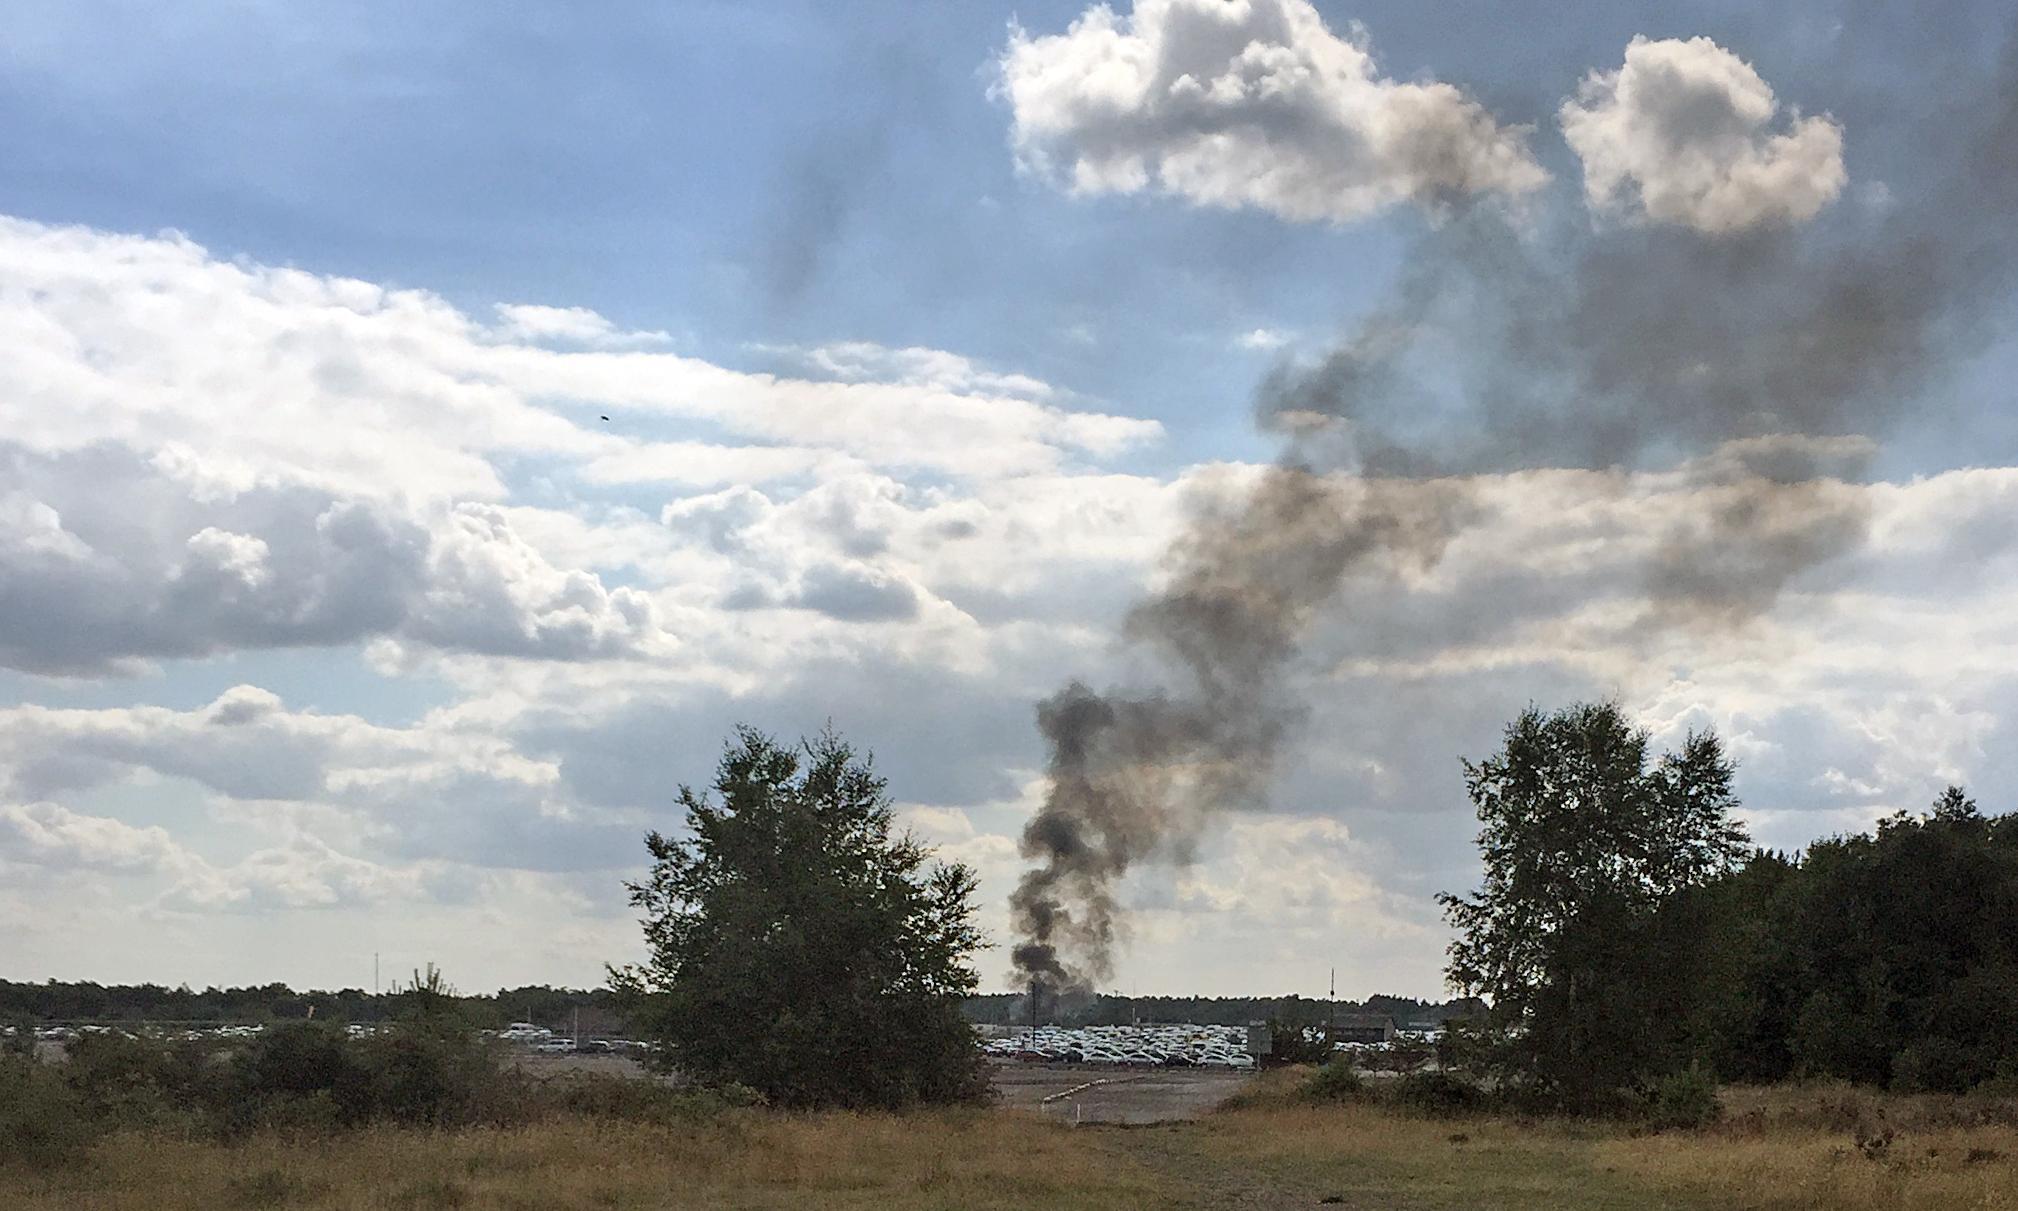 Bin Laden plane crash: jet went down in near perfect conditions